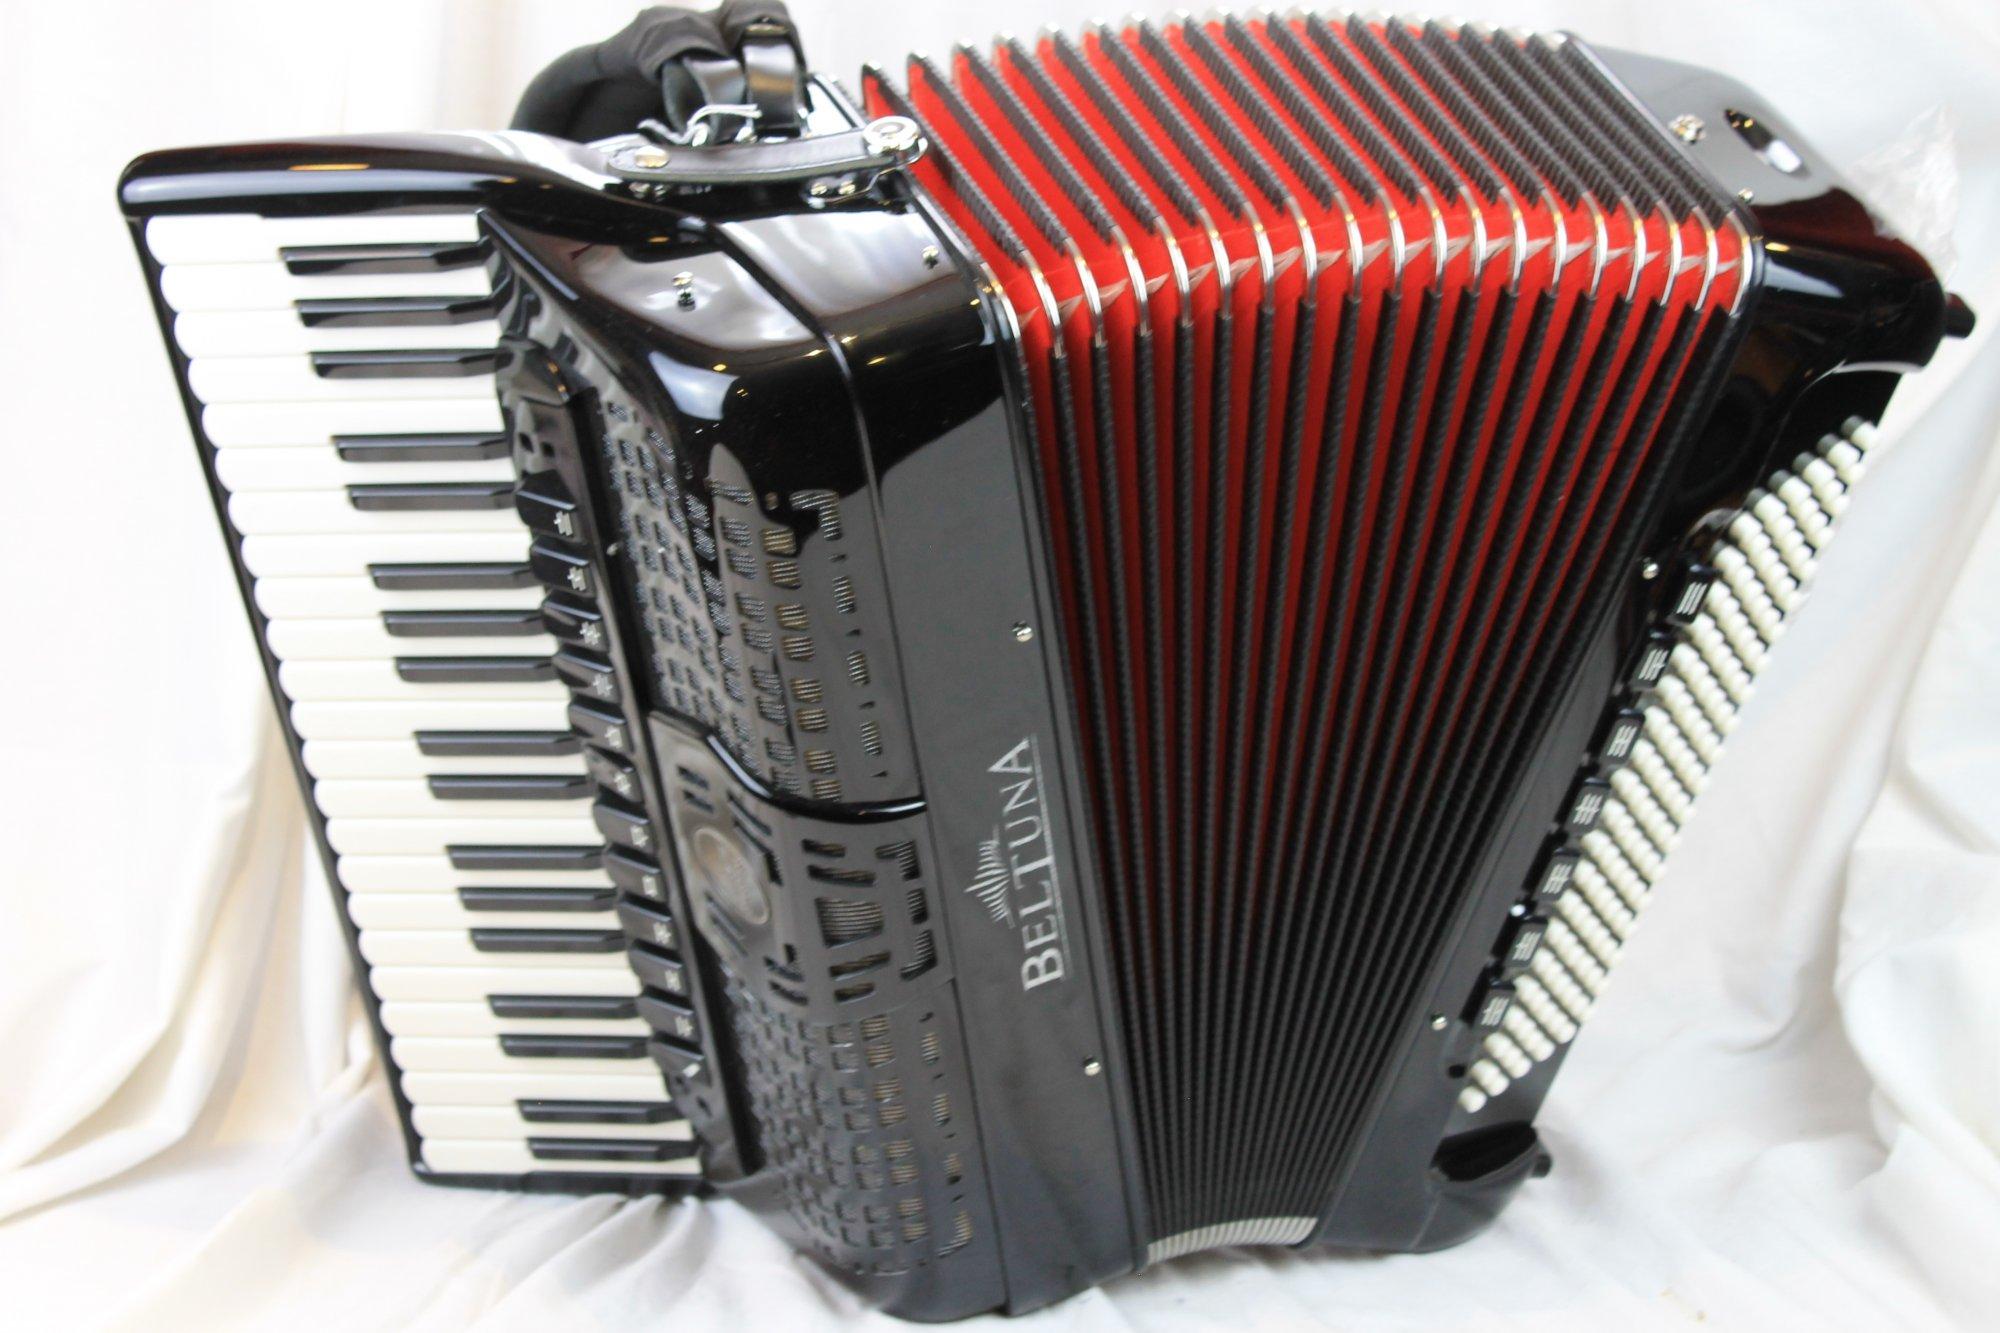 NEW Black Beltuna Prestige IV Piano Accordion LMMH 41 120